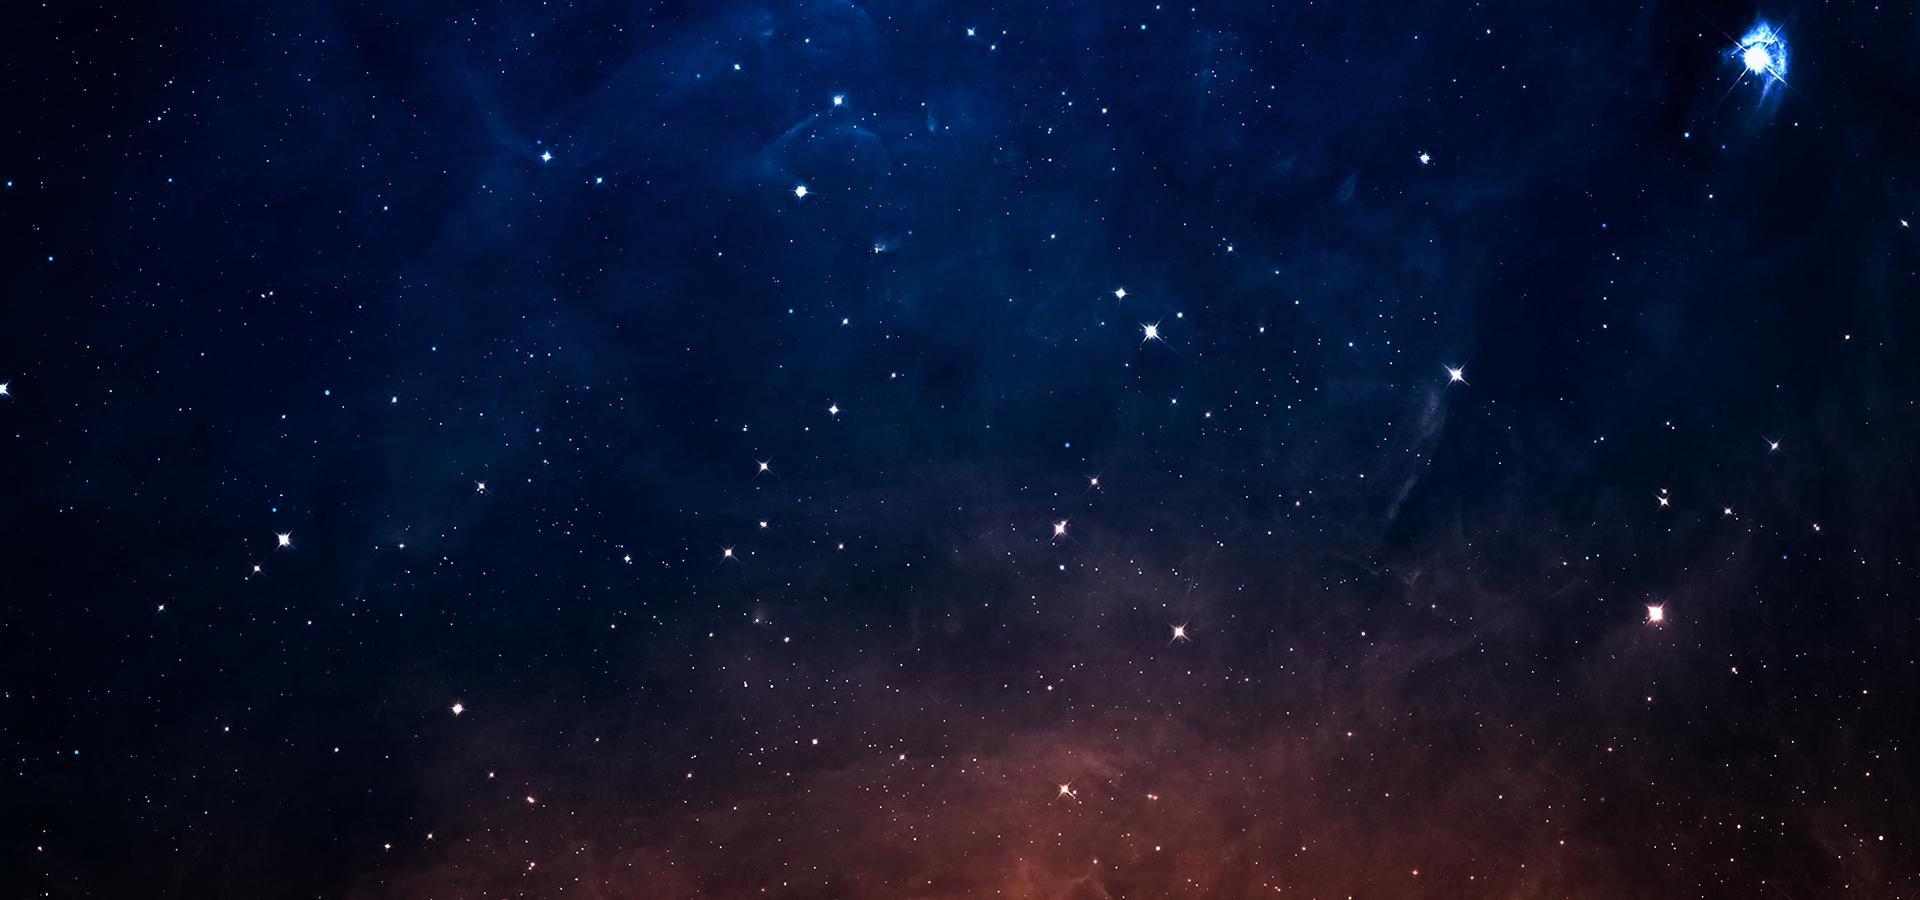 star corps c u00e9leste l u0026 39 espace les  u00e9toiles contexte l